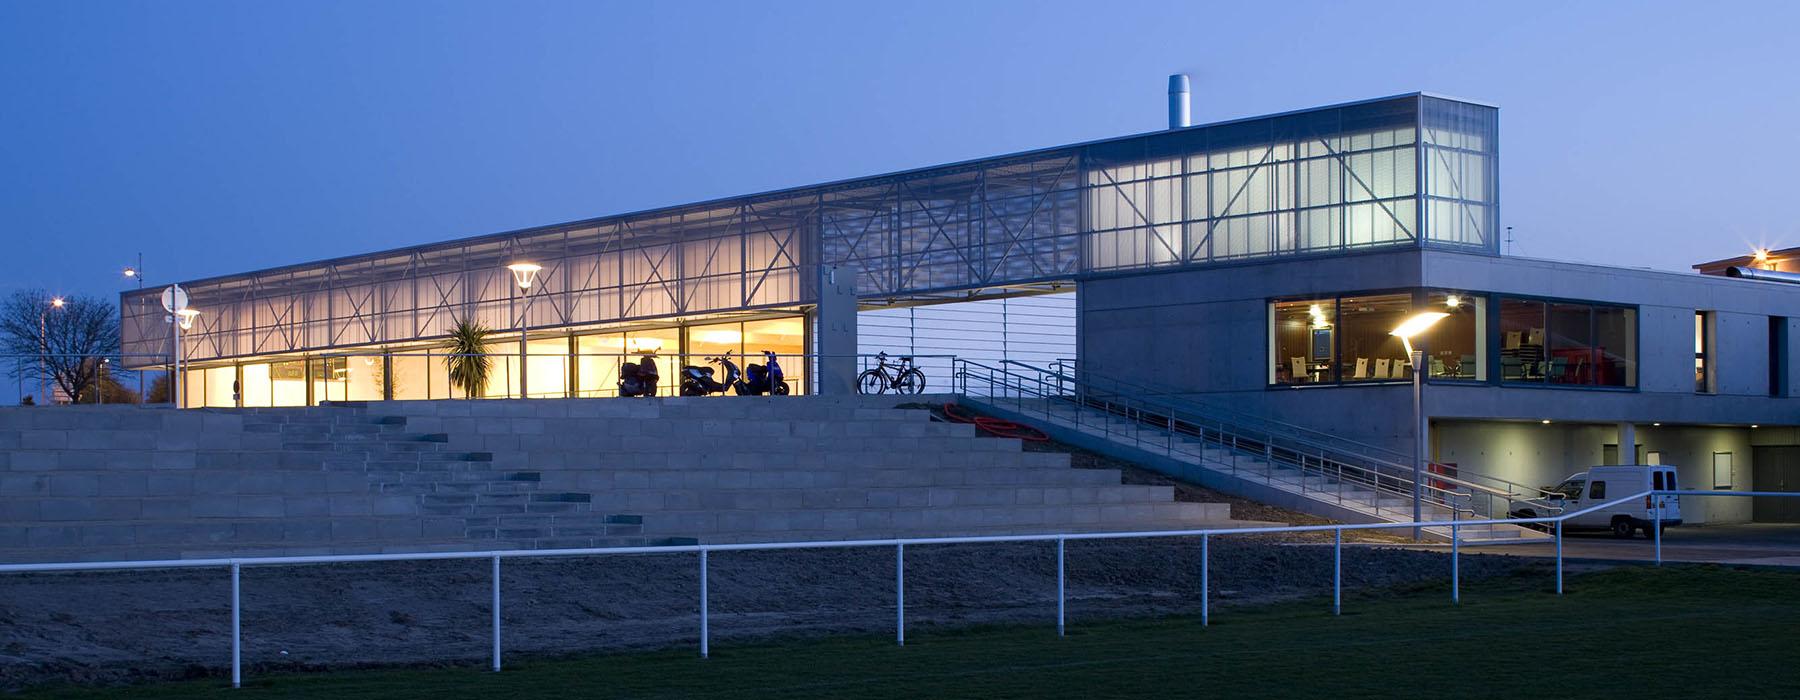 Complexe Sportif et Associatif de Granville